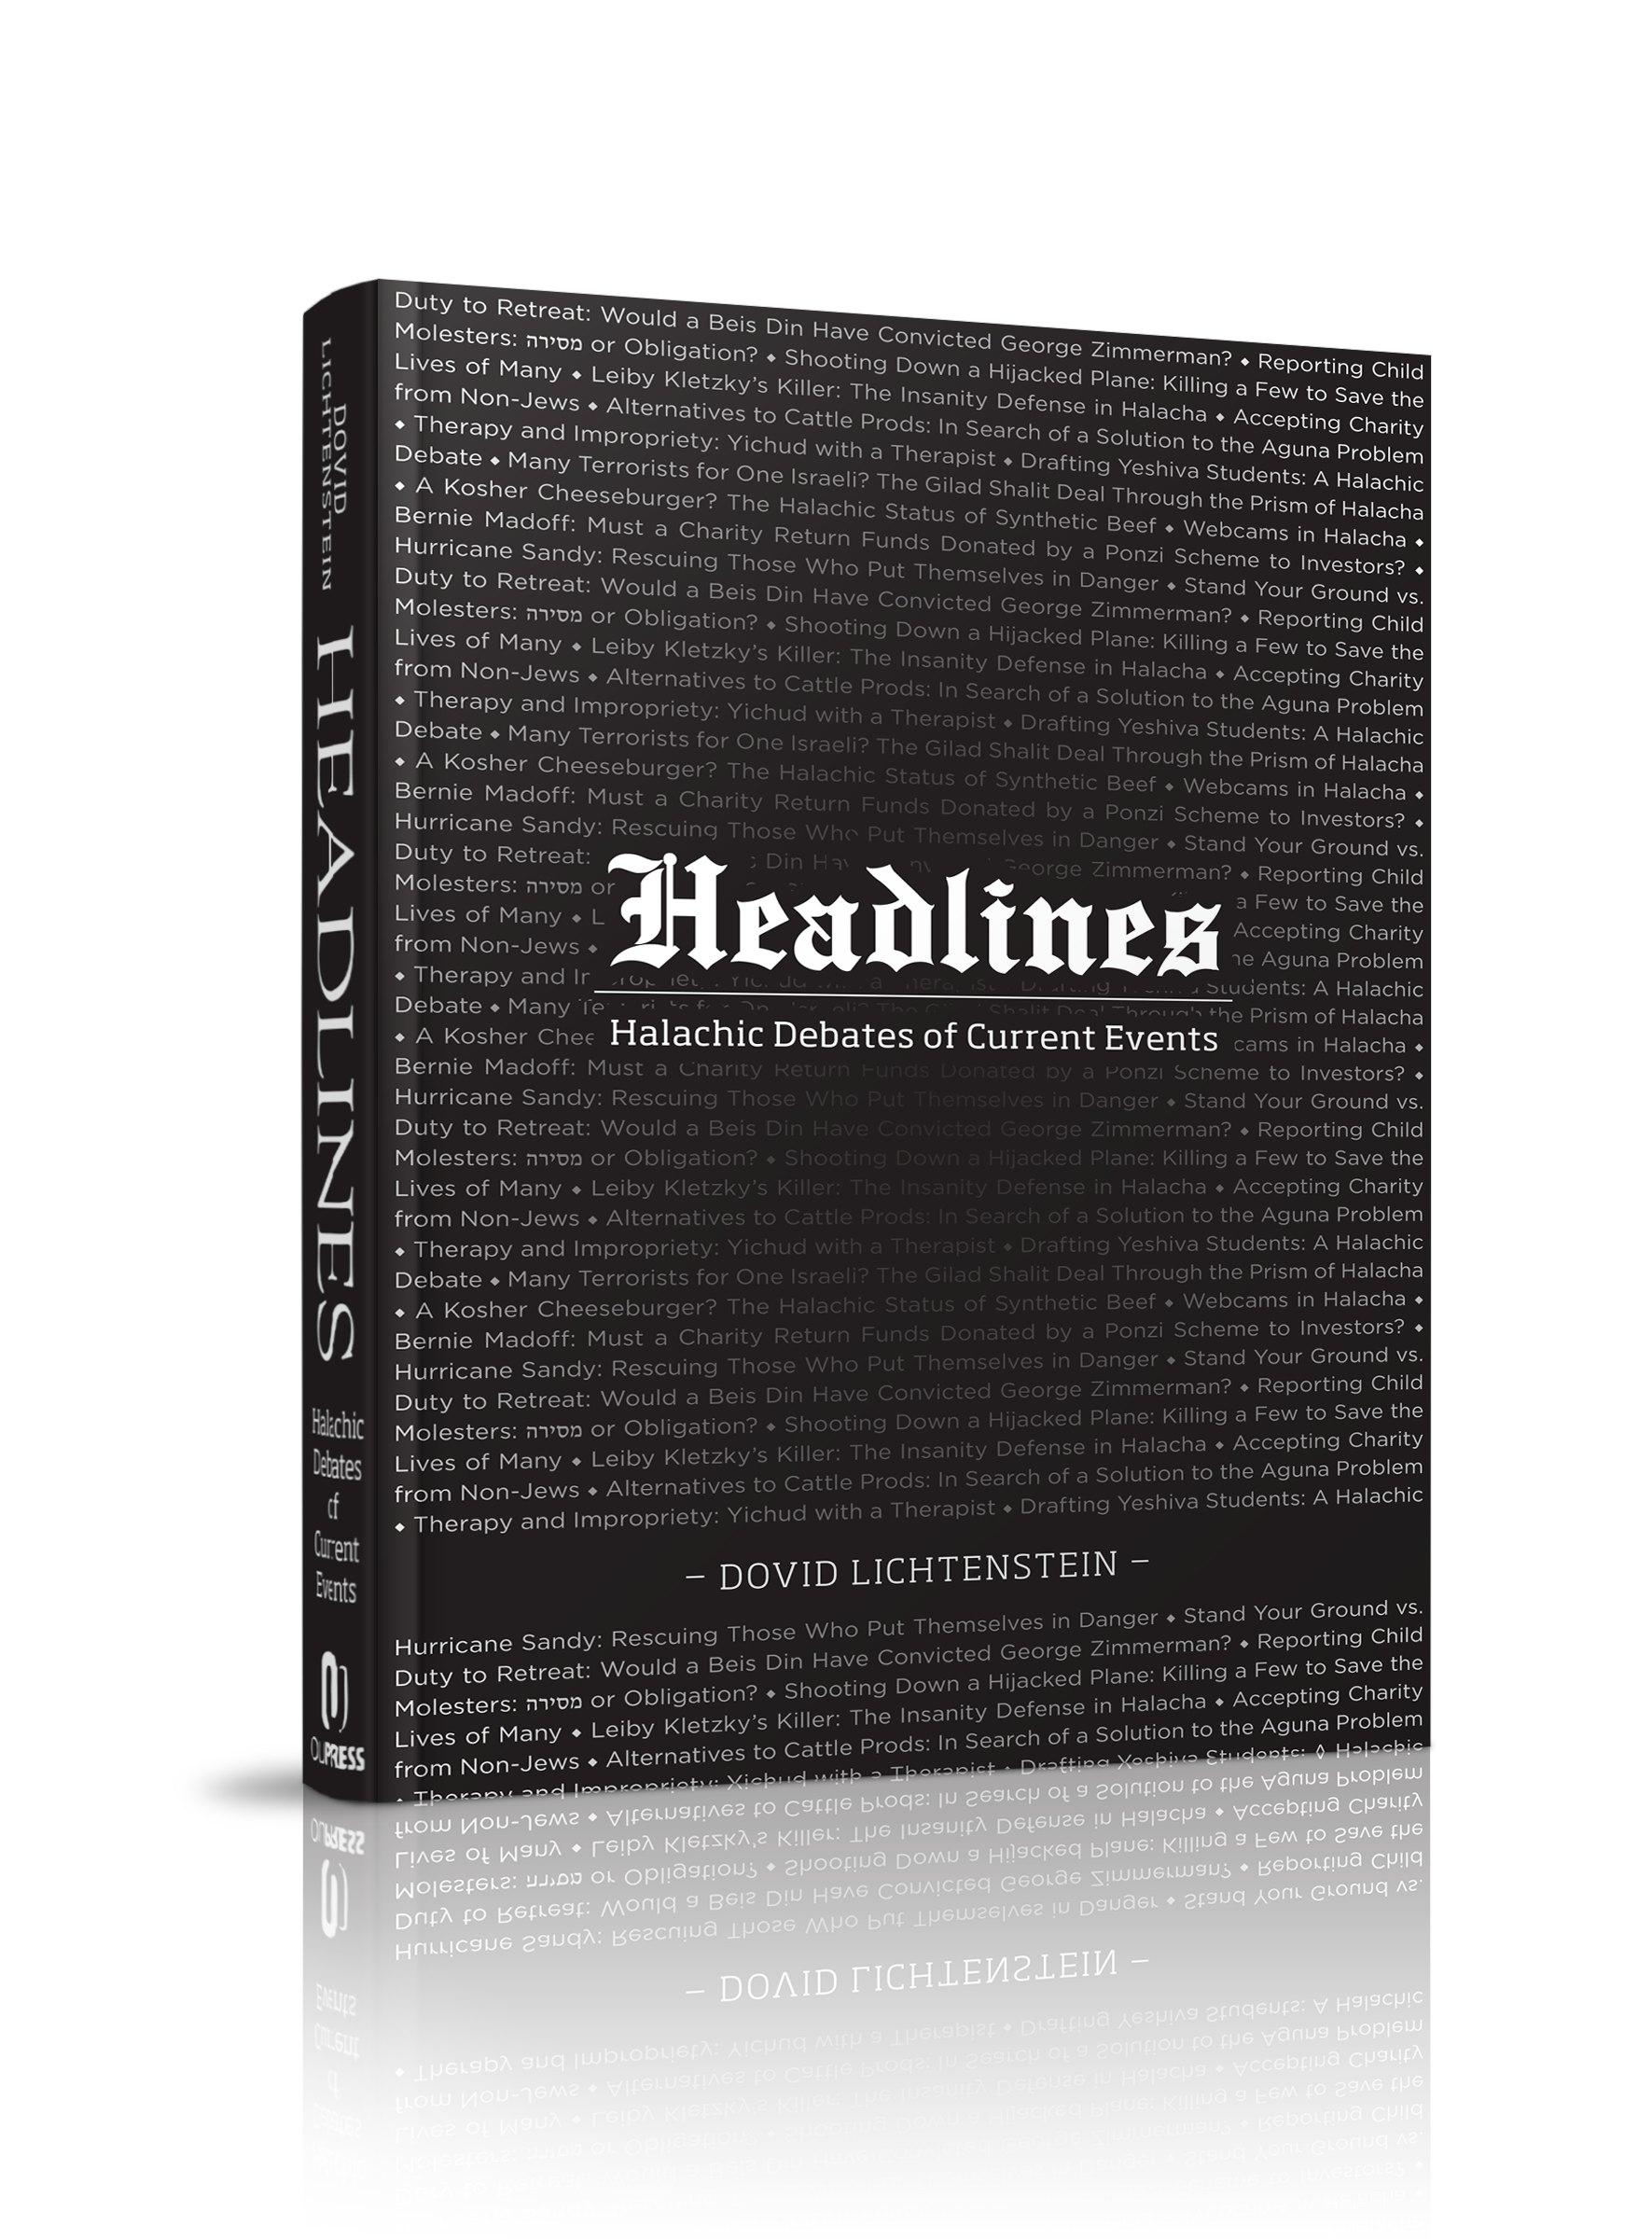 Headlines book